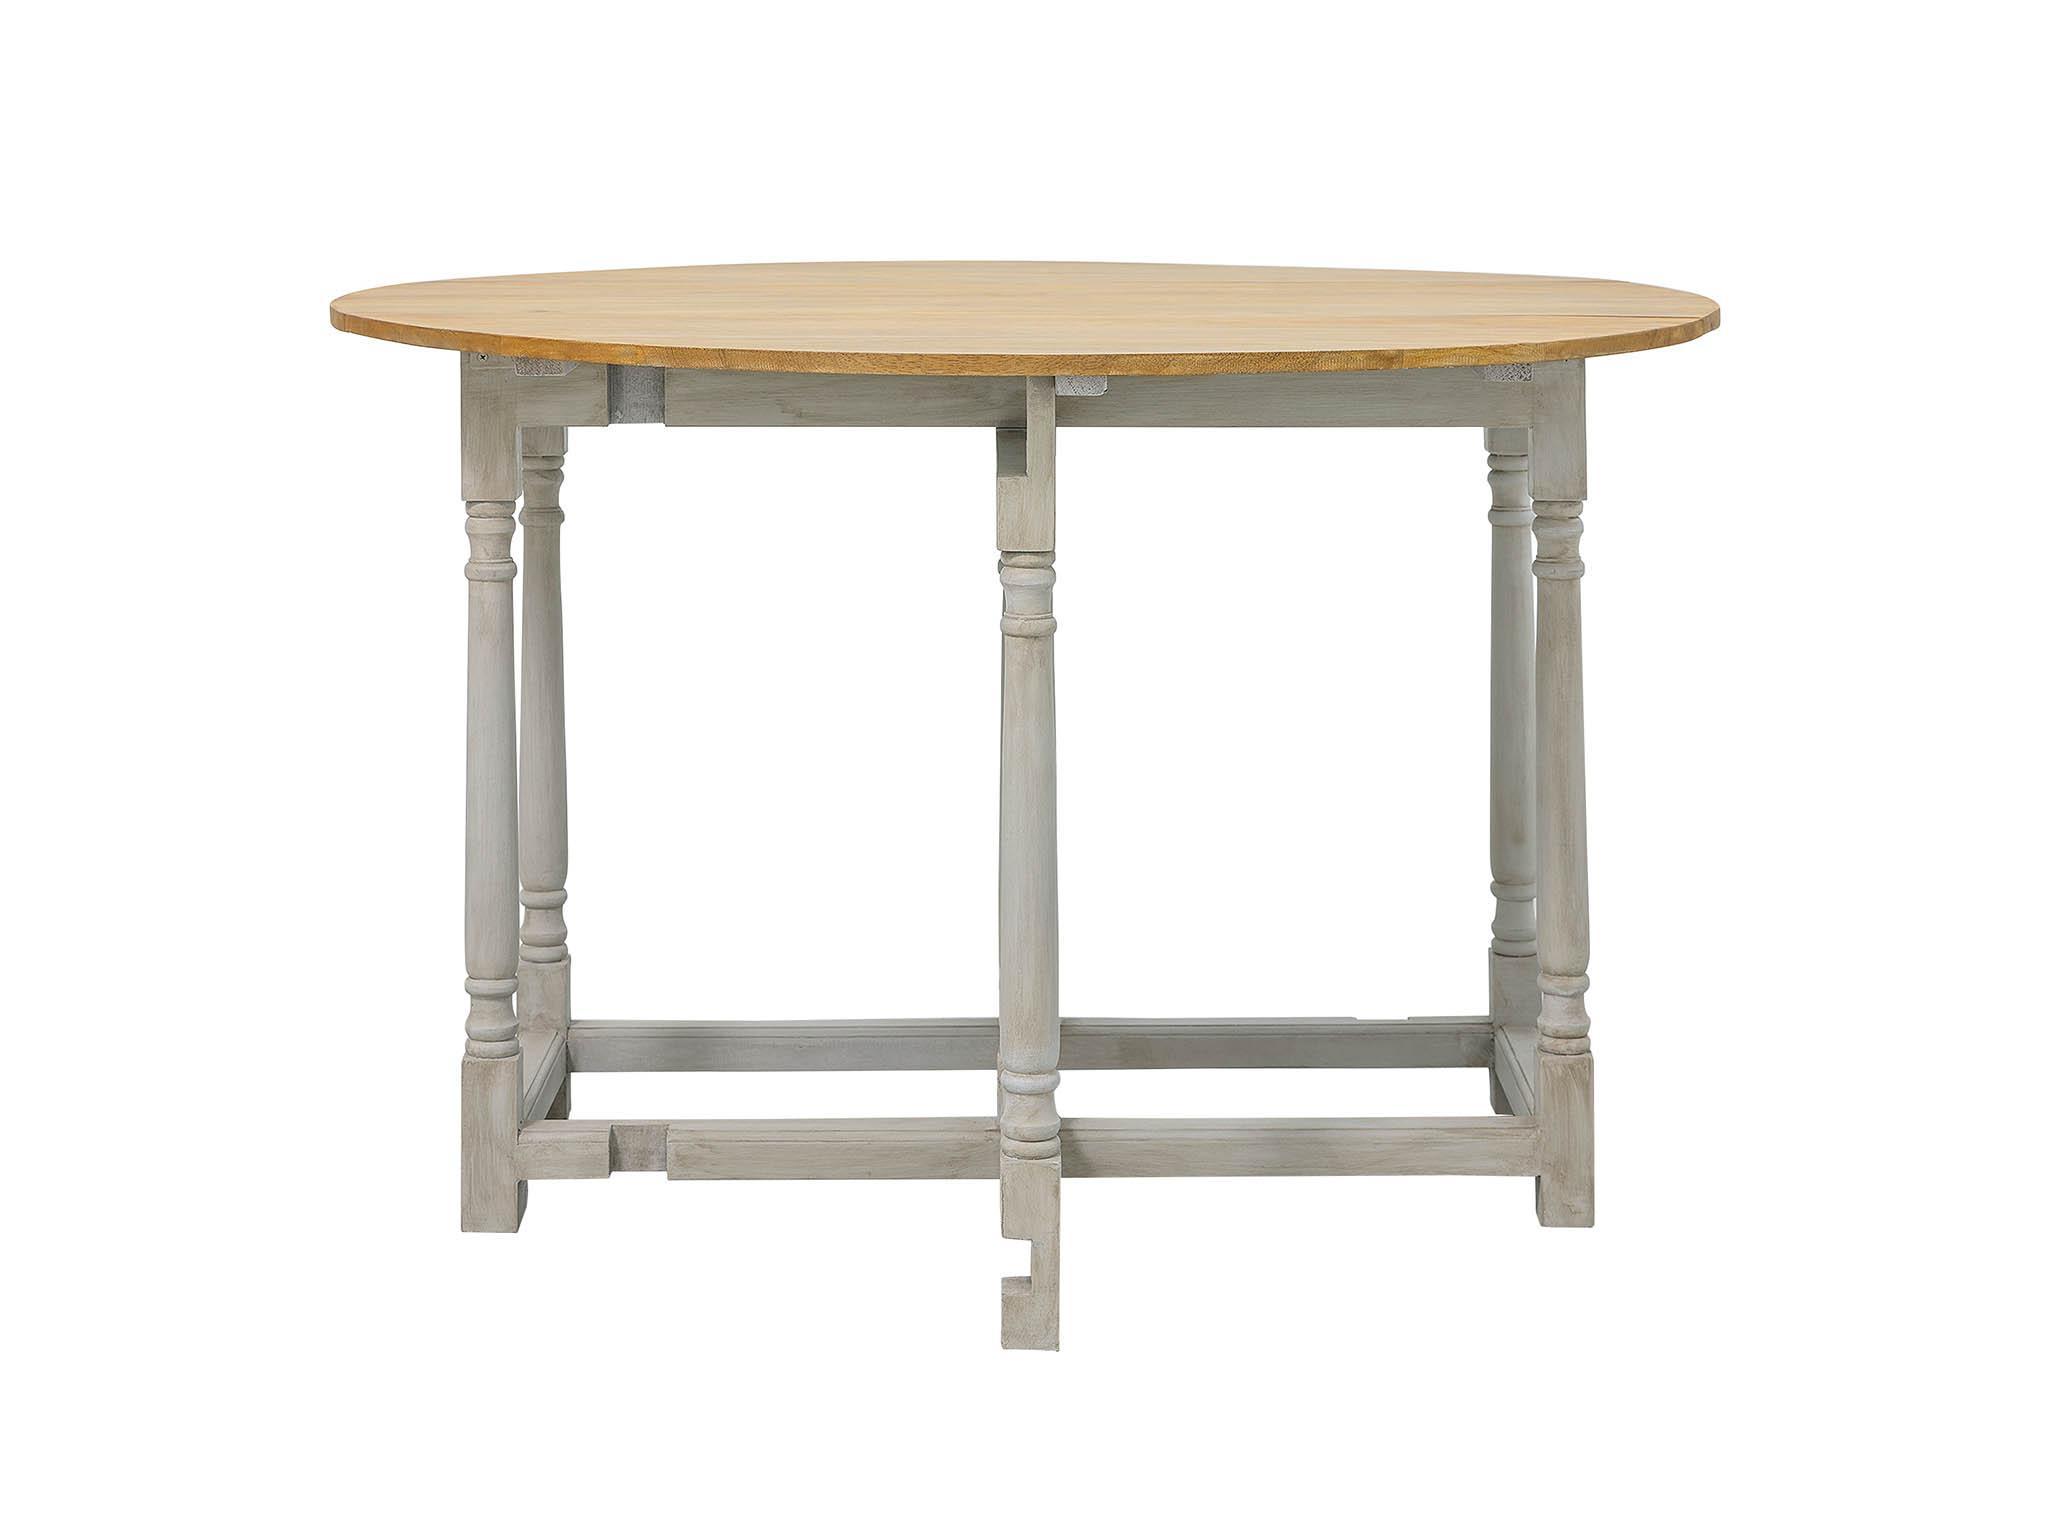 The Independent Regarding Medium Elegant Dining Tables (View 27 of 30)